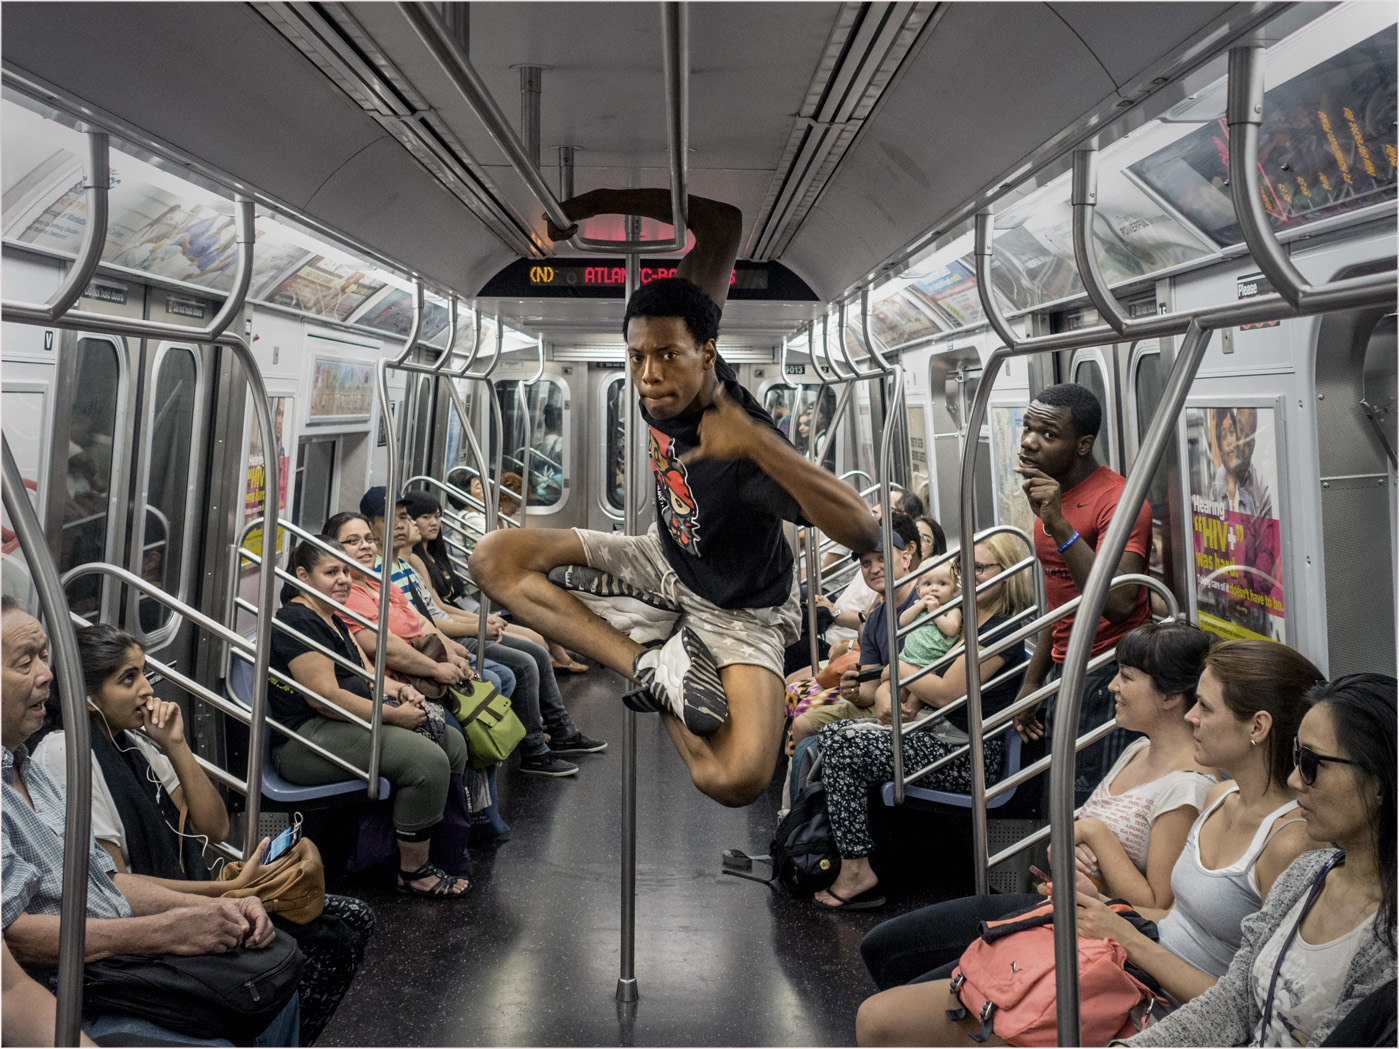 Dc metro passangers are assholes